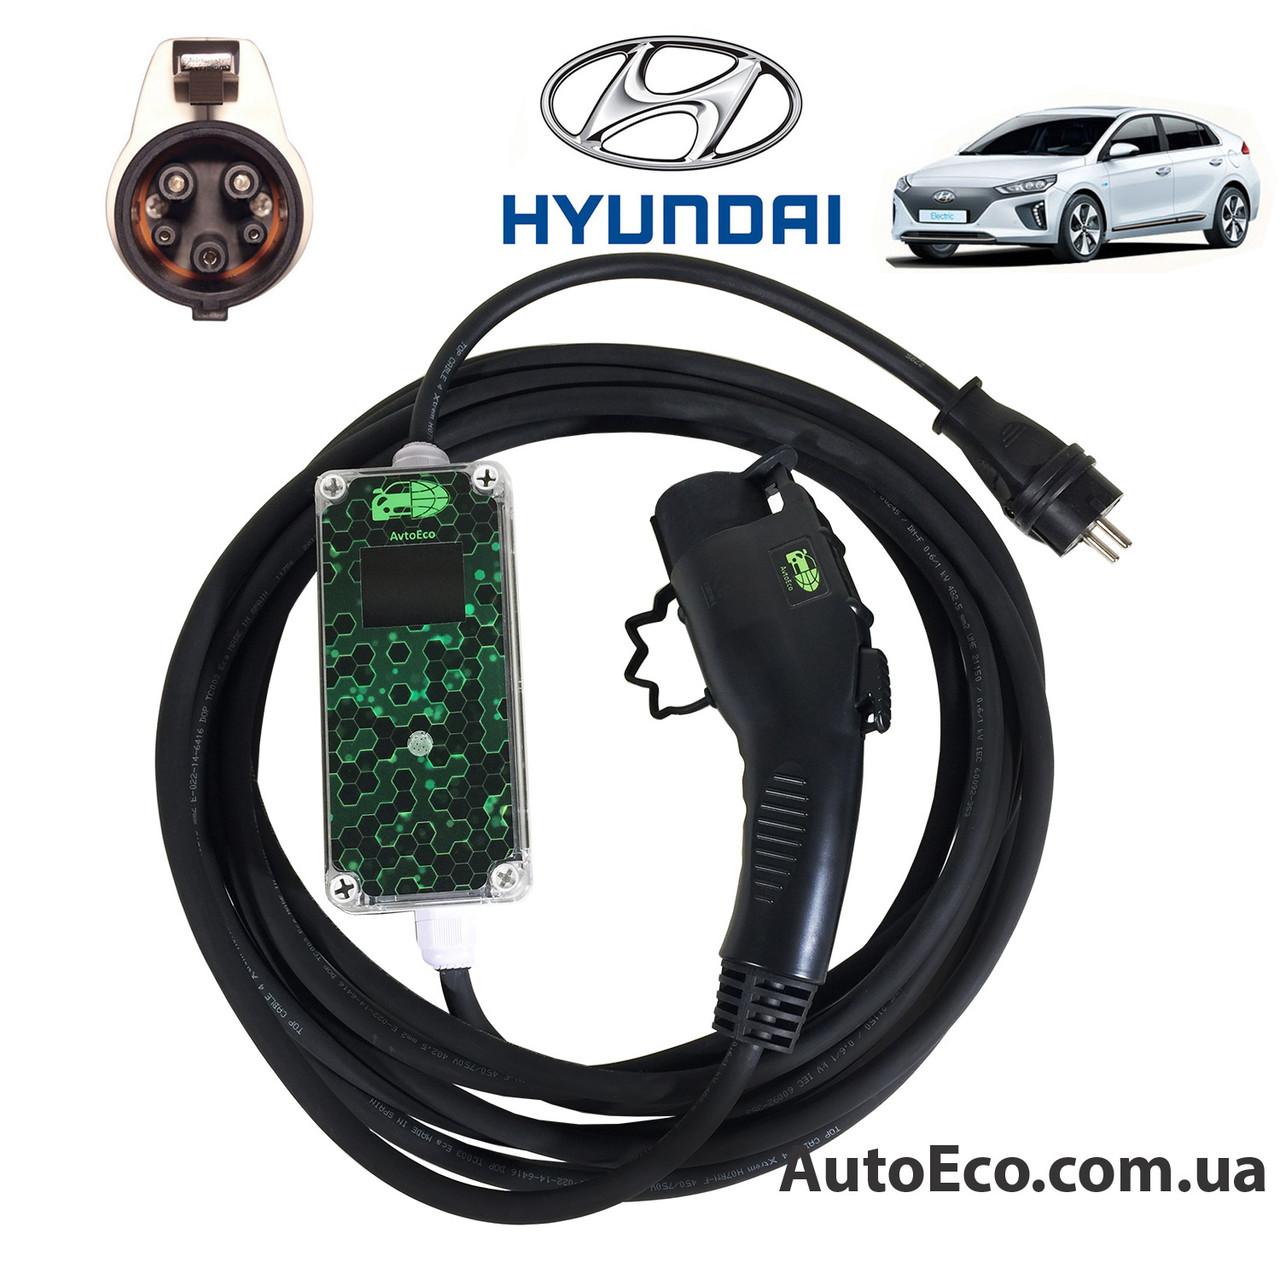 Зарядное устройство для электромобиля Hyundai IONIQ Electric AutoEco J1772-16A-Wi-Fi